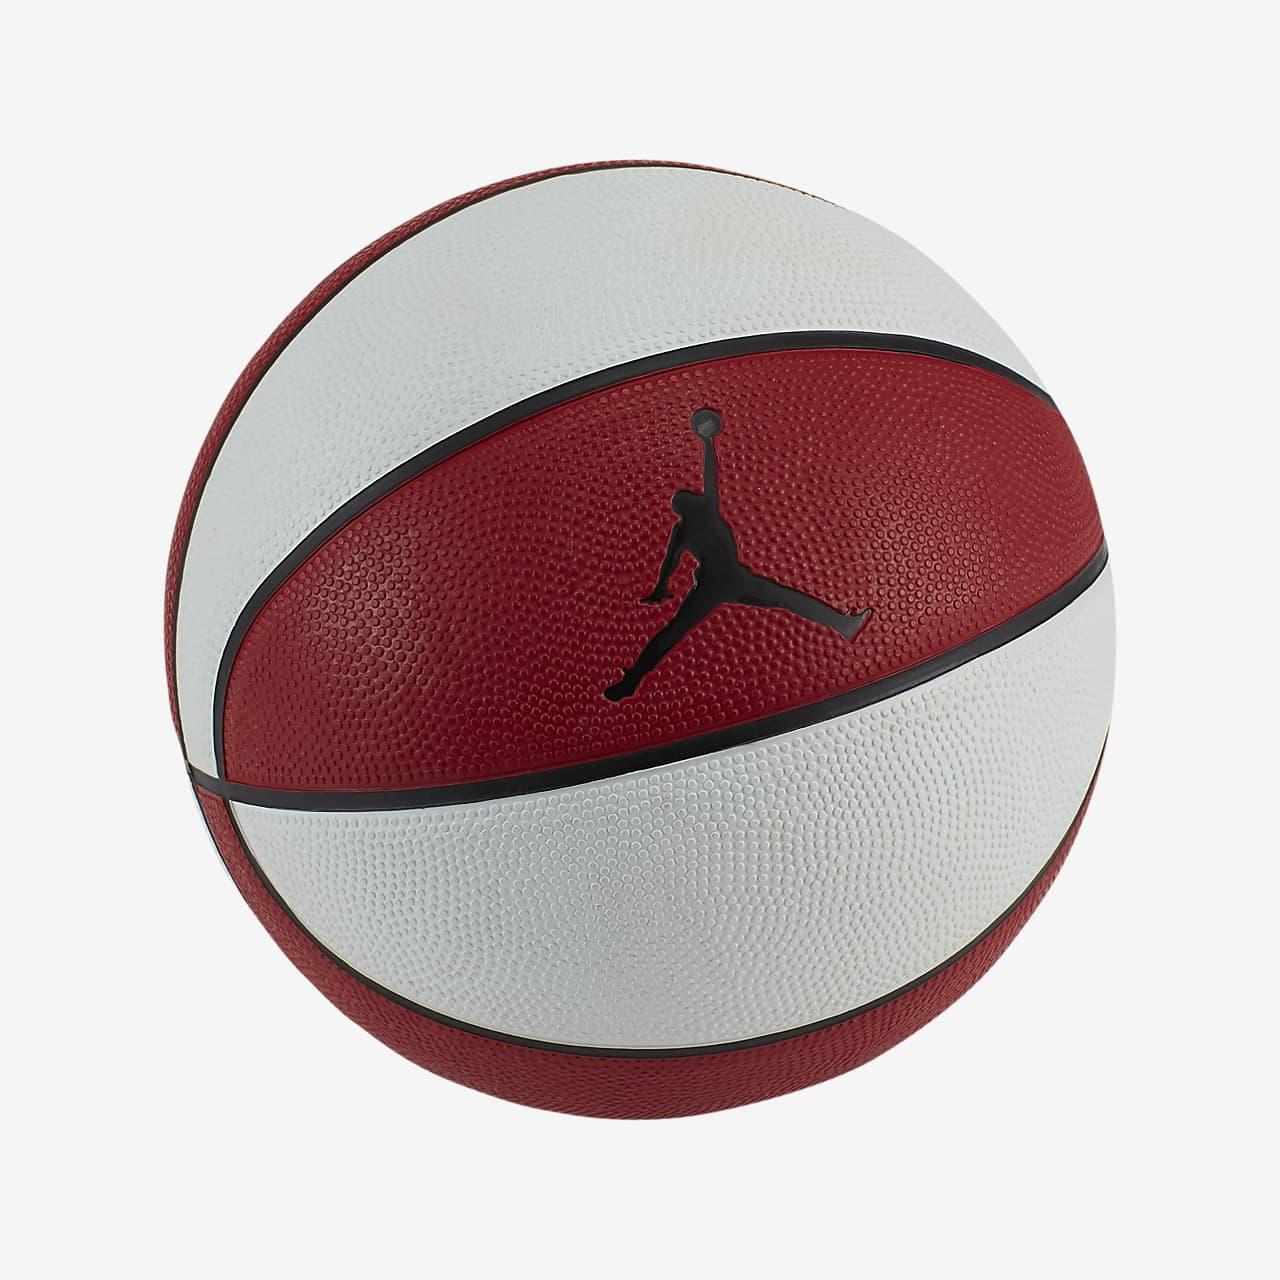 Jordan Skills Basketball (Size 3)